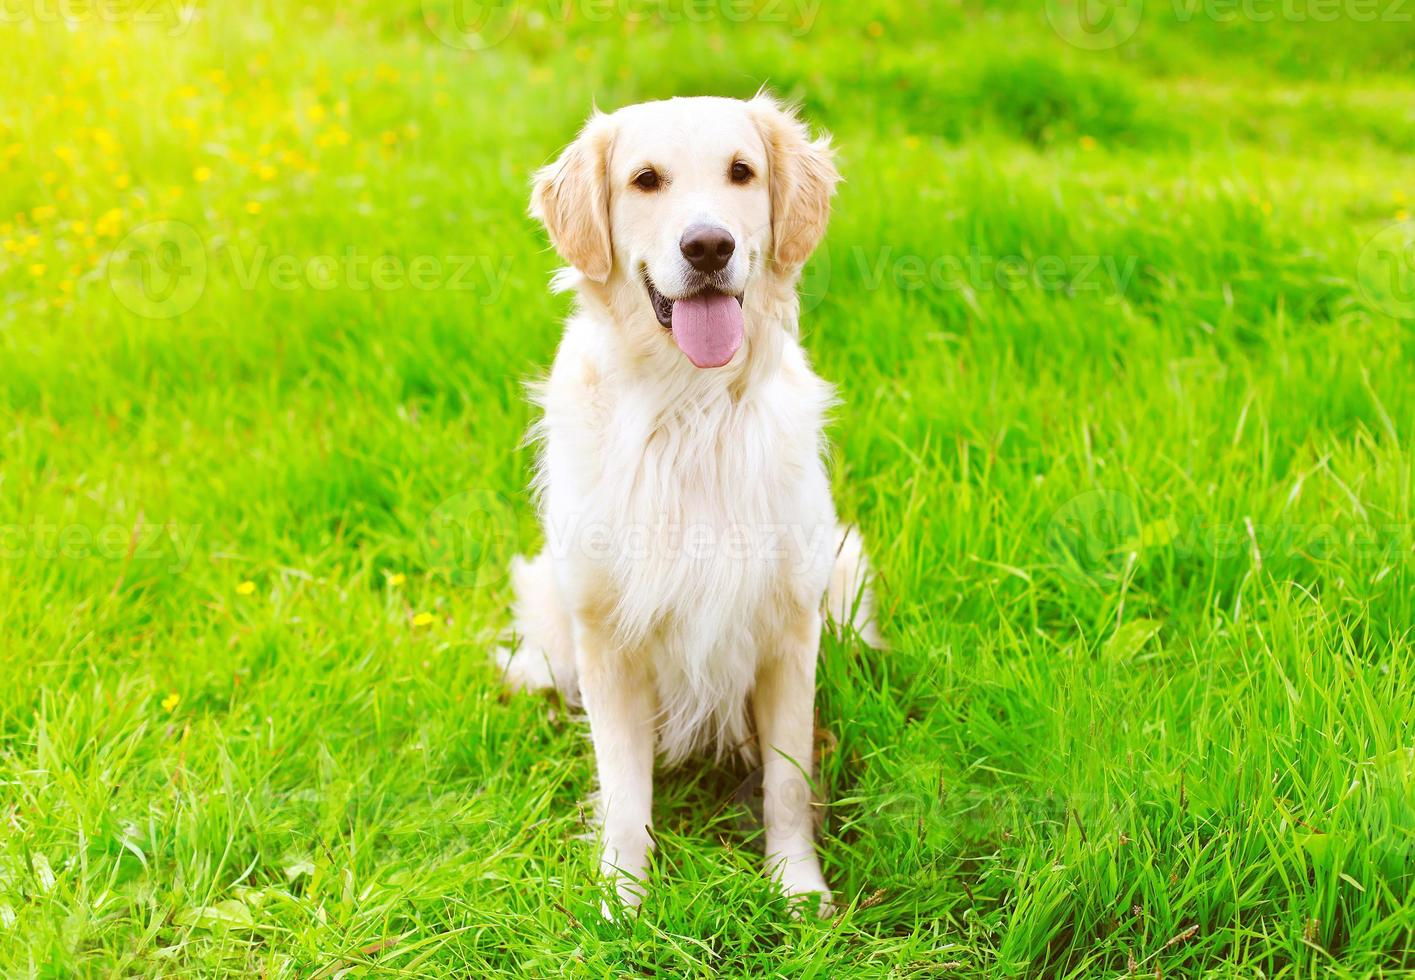 gelukkig golden retriever hond zittend op het groene gras zomer foto